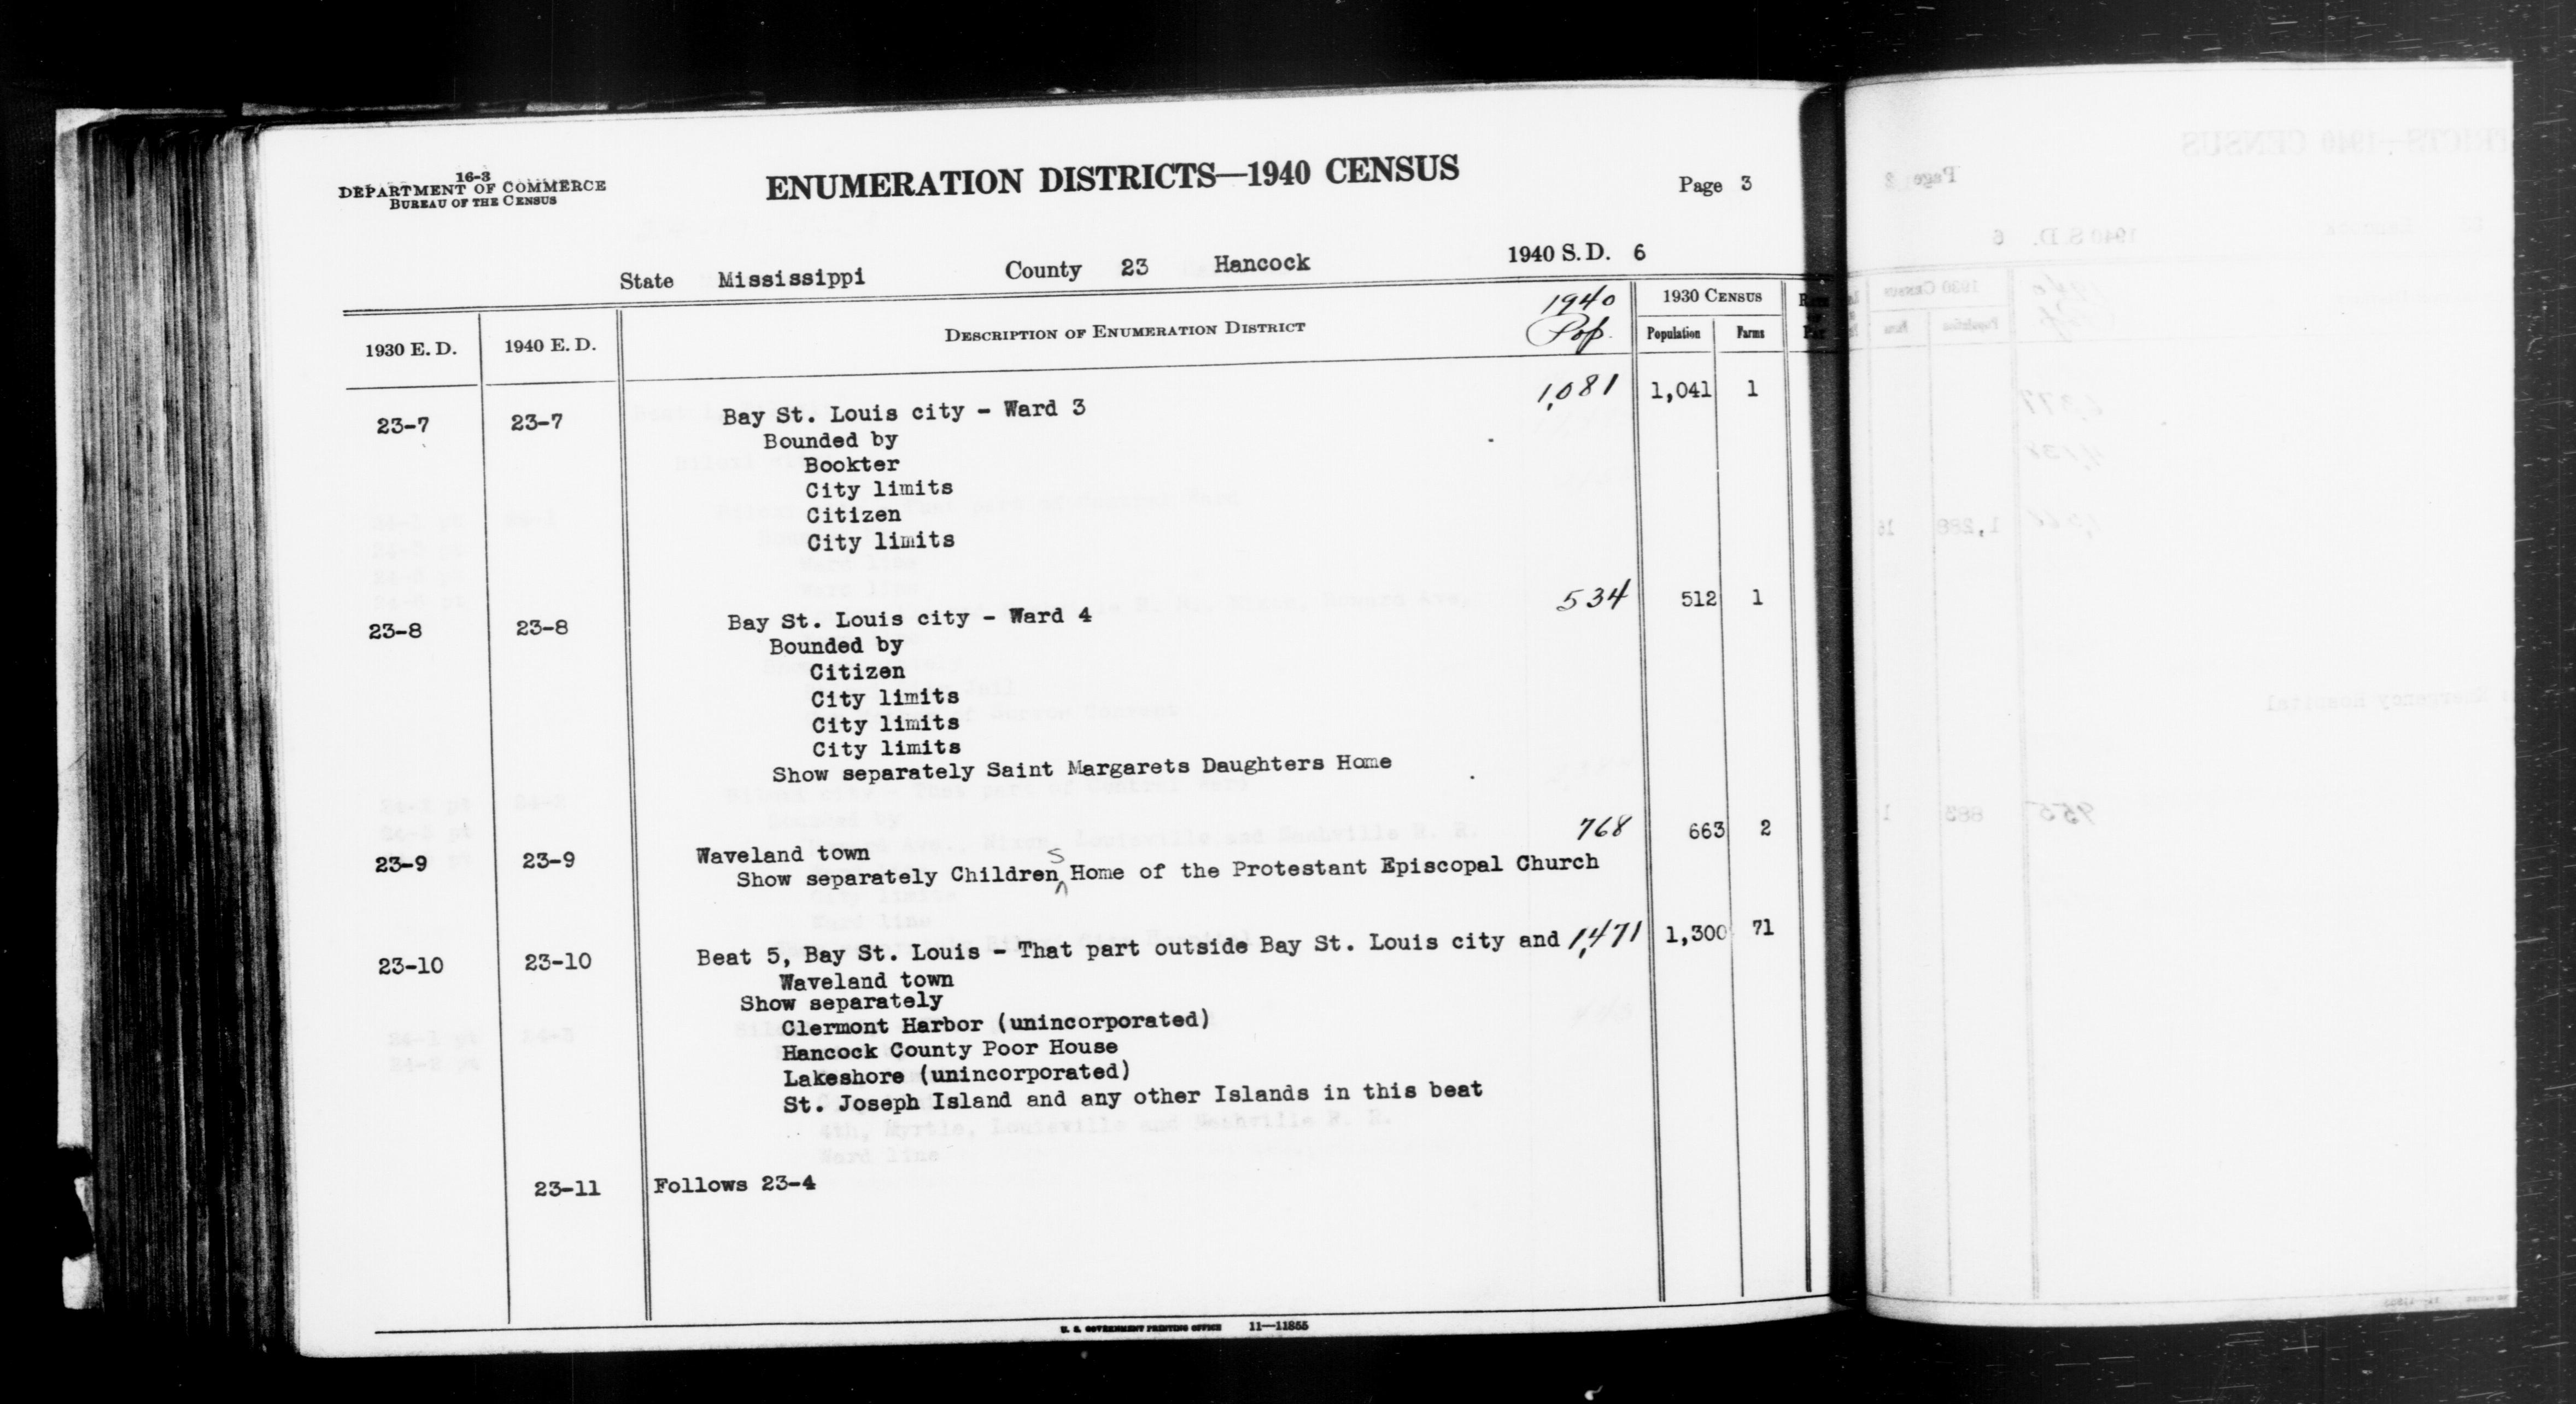 1940 Census Enumeration District Descriptions - Mississippi - Hancock County - ED 23-7, ED 23-8, ED 23-9, ED 23-10